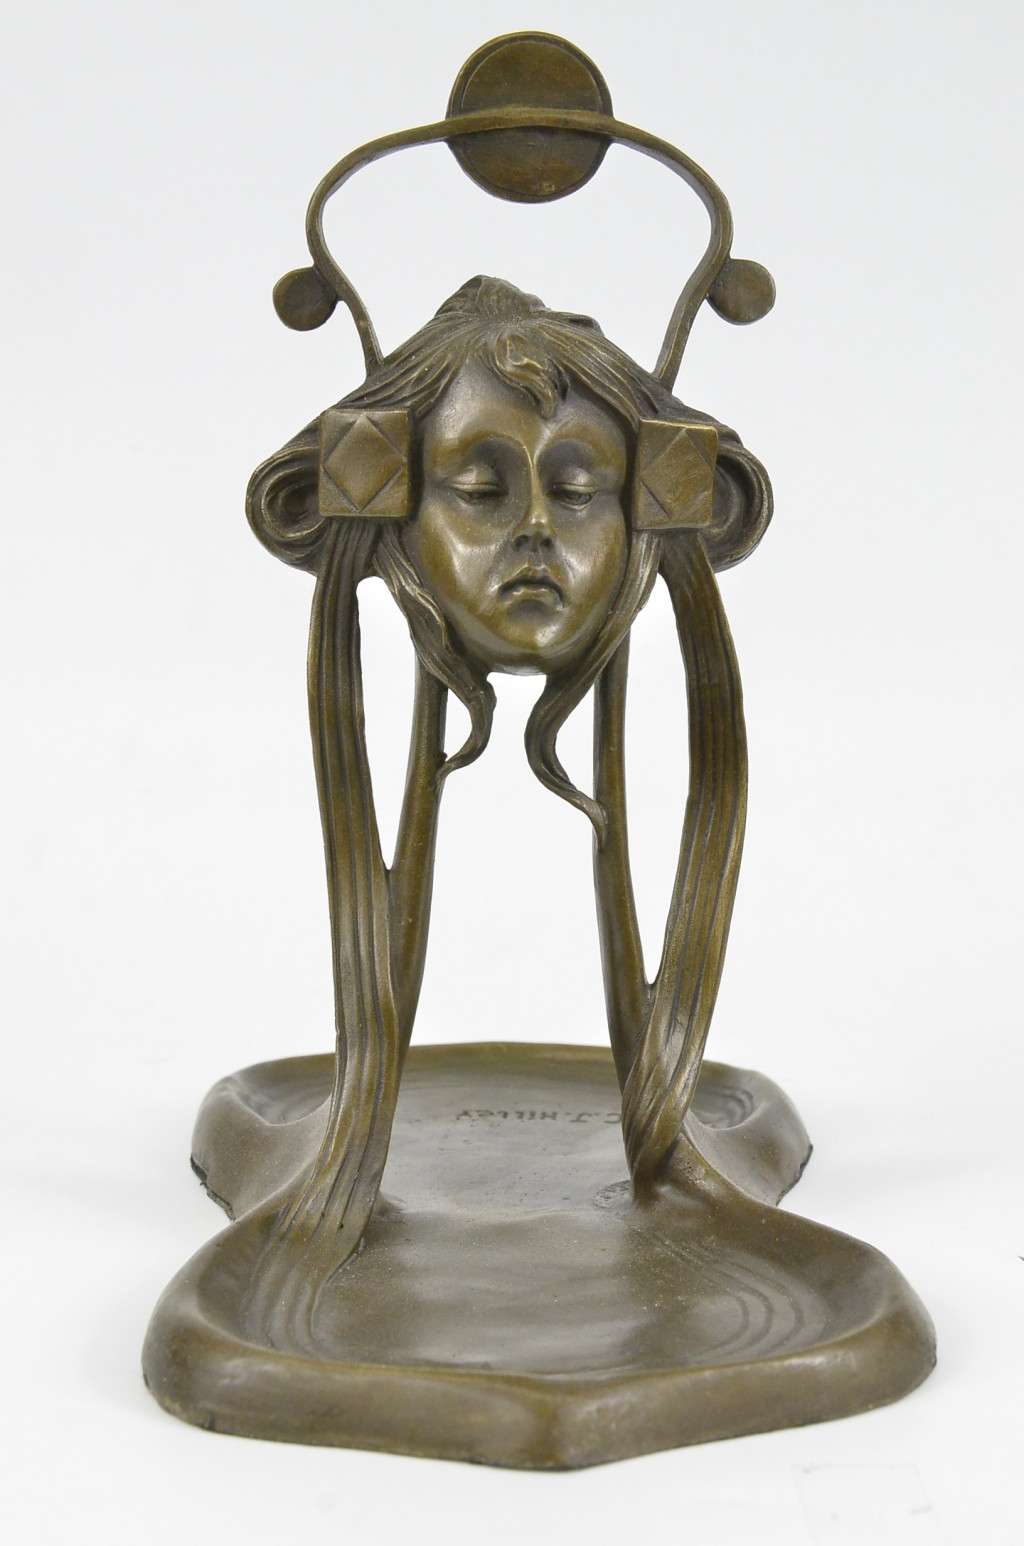 art nouveau deco jewelry tray soap bus bronze sculpture figurine statue bz ebay. Black Bedroom Furniture Sets. Home Design Ideas